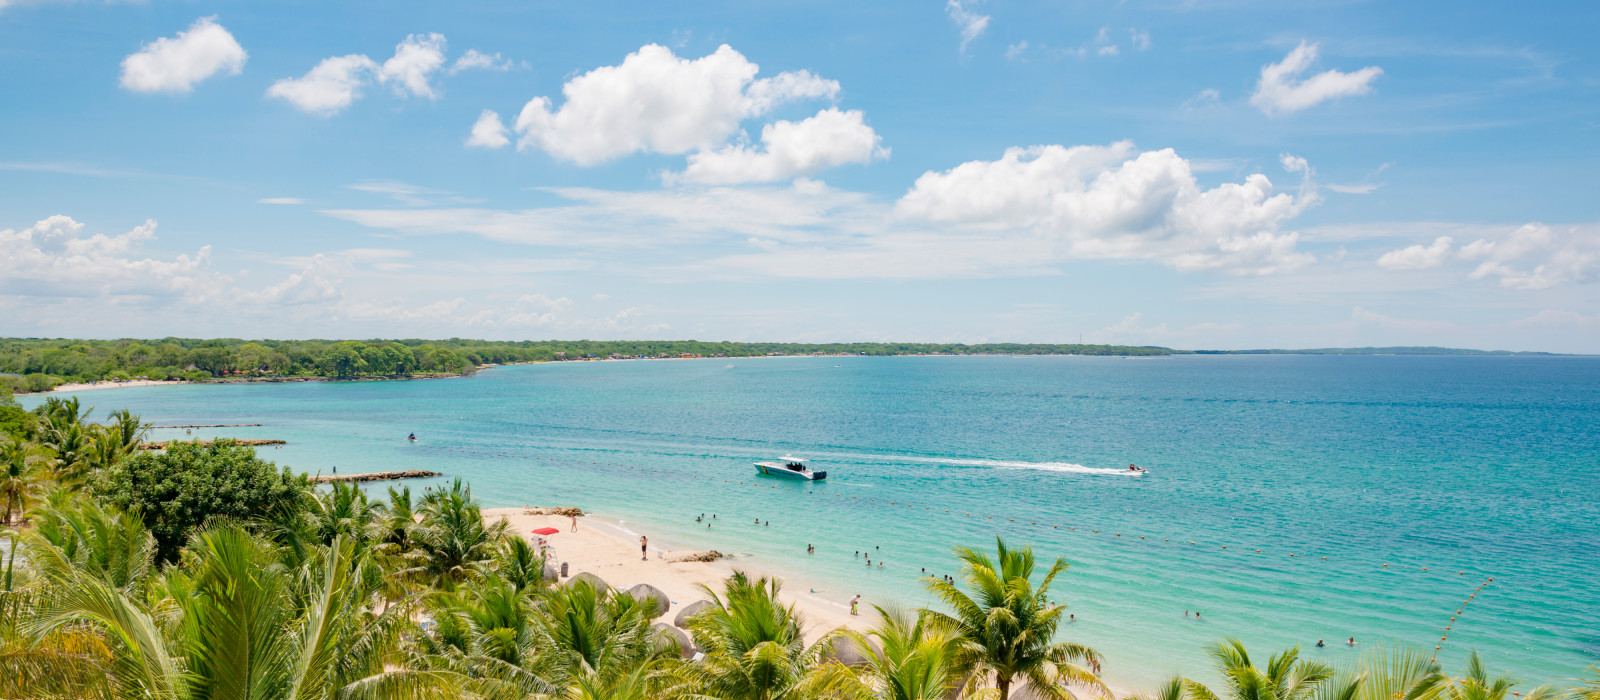 Destination Barú Island Colombia